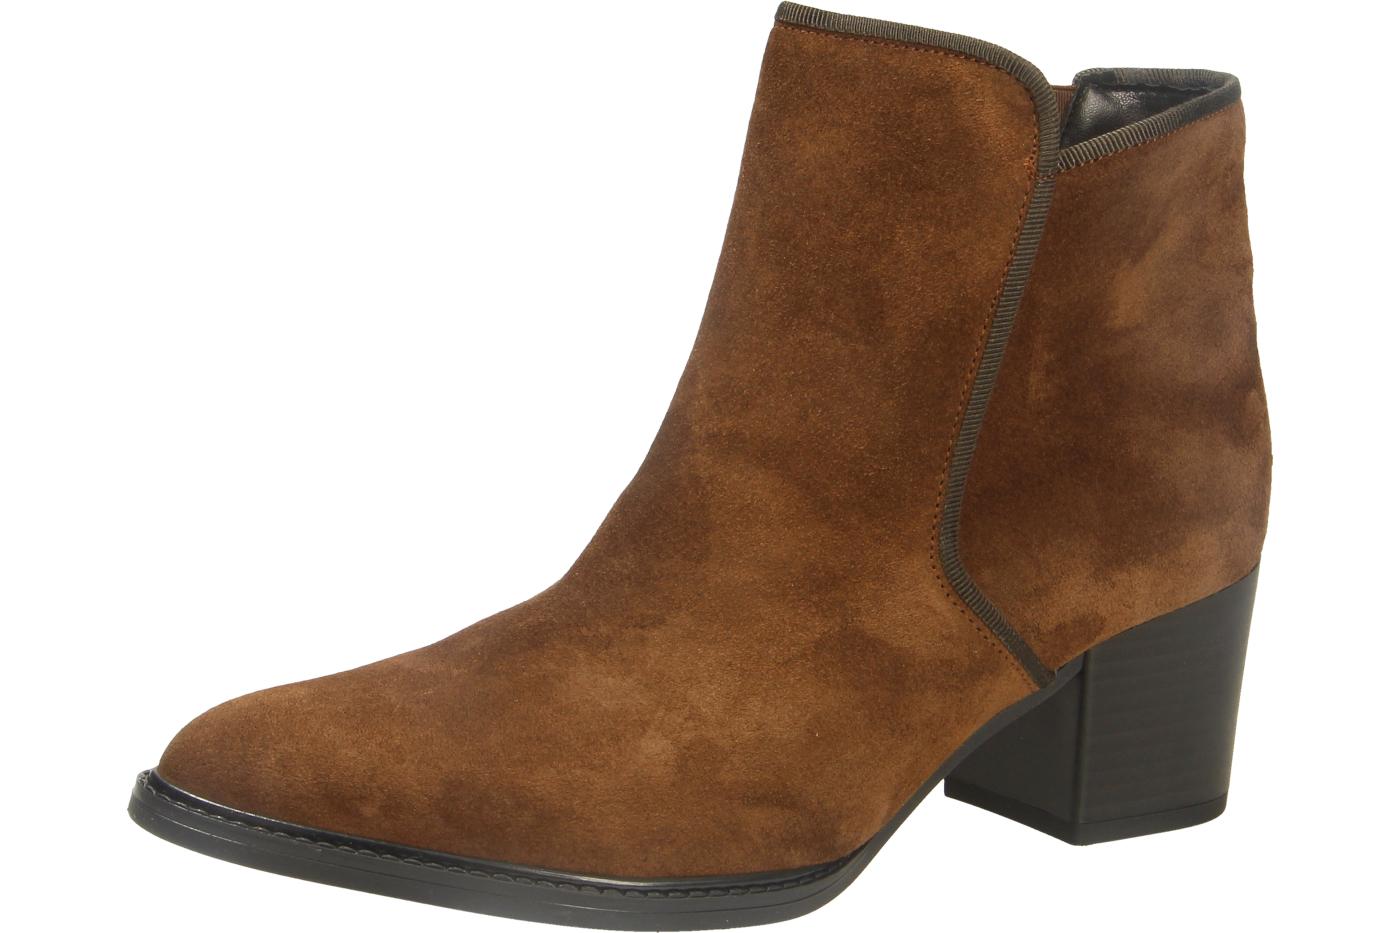 lowest price a2450 c33b7 Gabor Comfort Stiefel 32.890.41